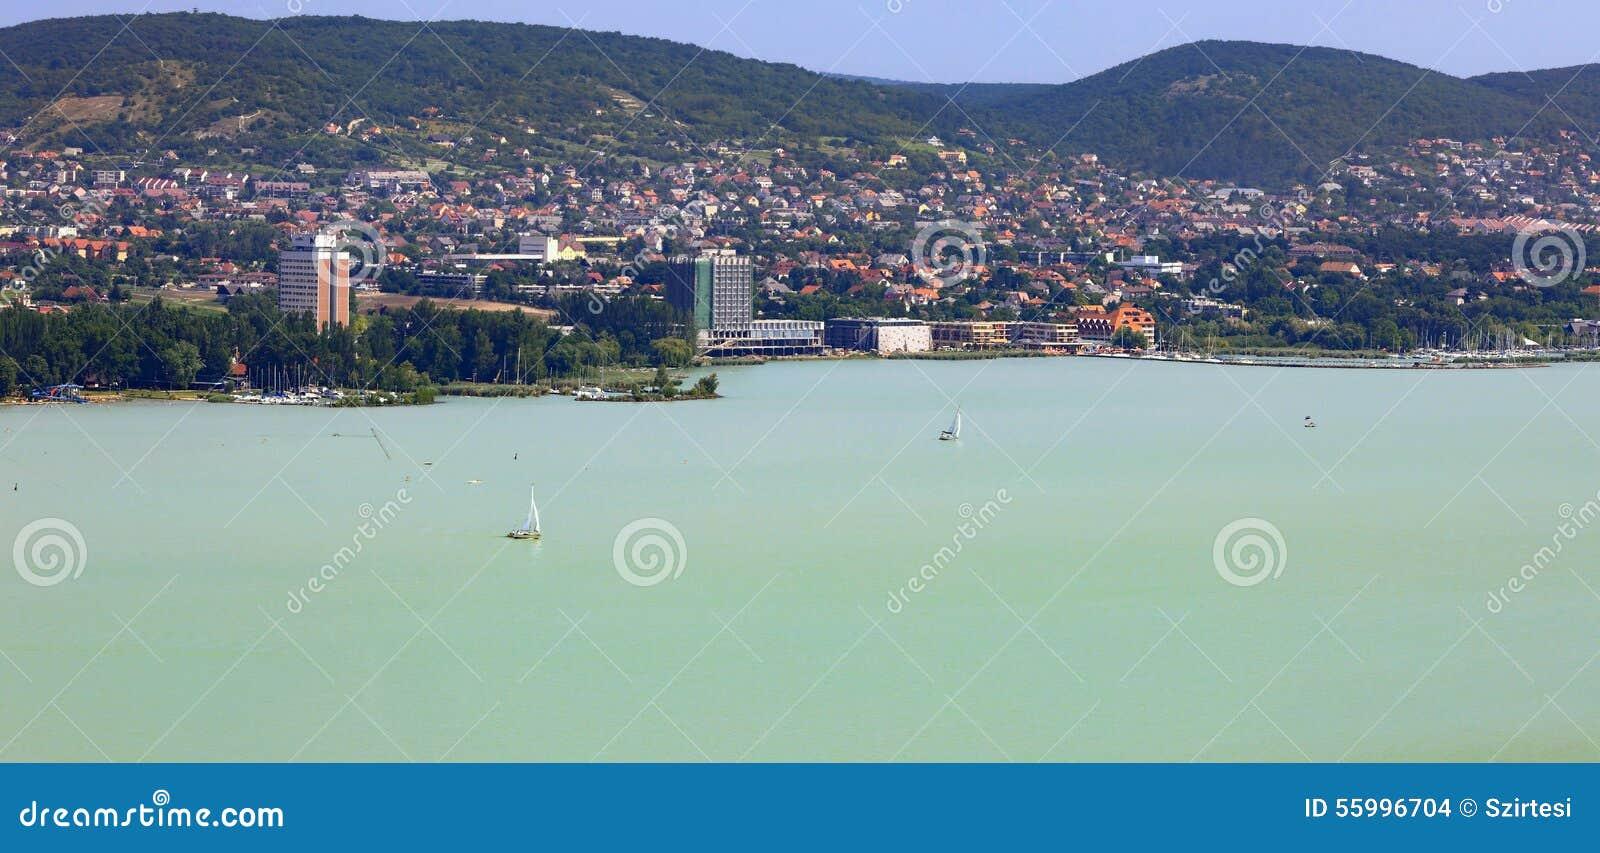 Balatonfured Hungary  city photos : Bay at Balatonfured in Hungary.